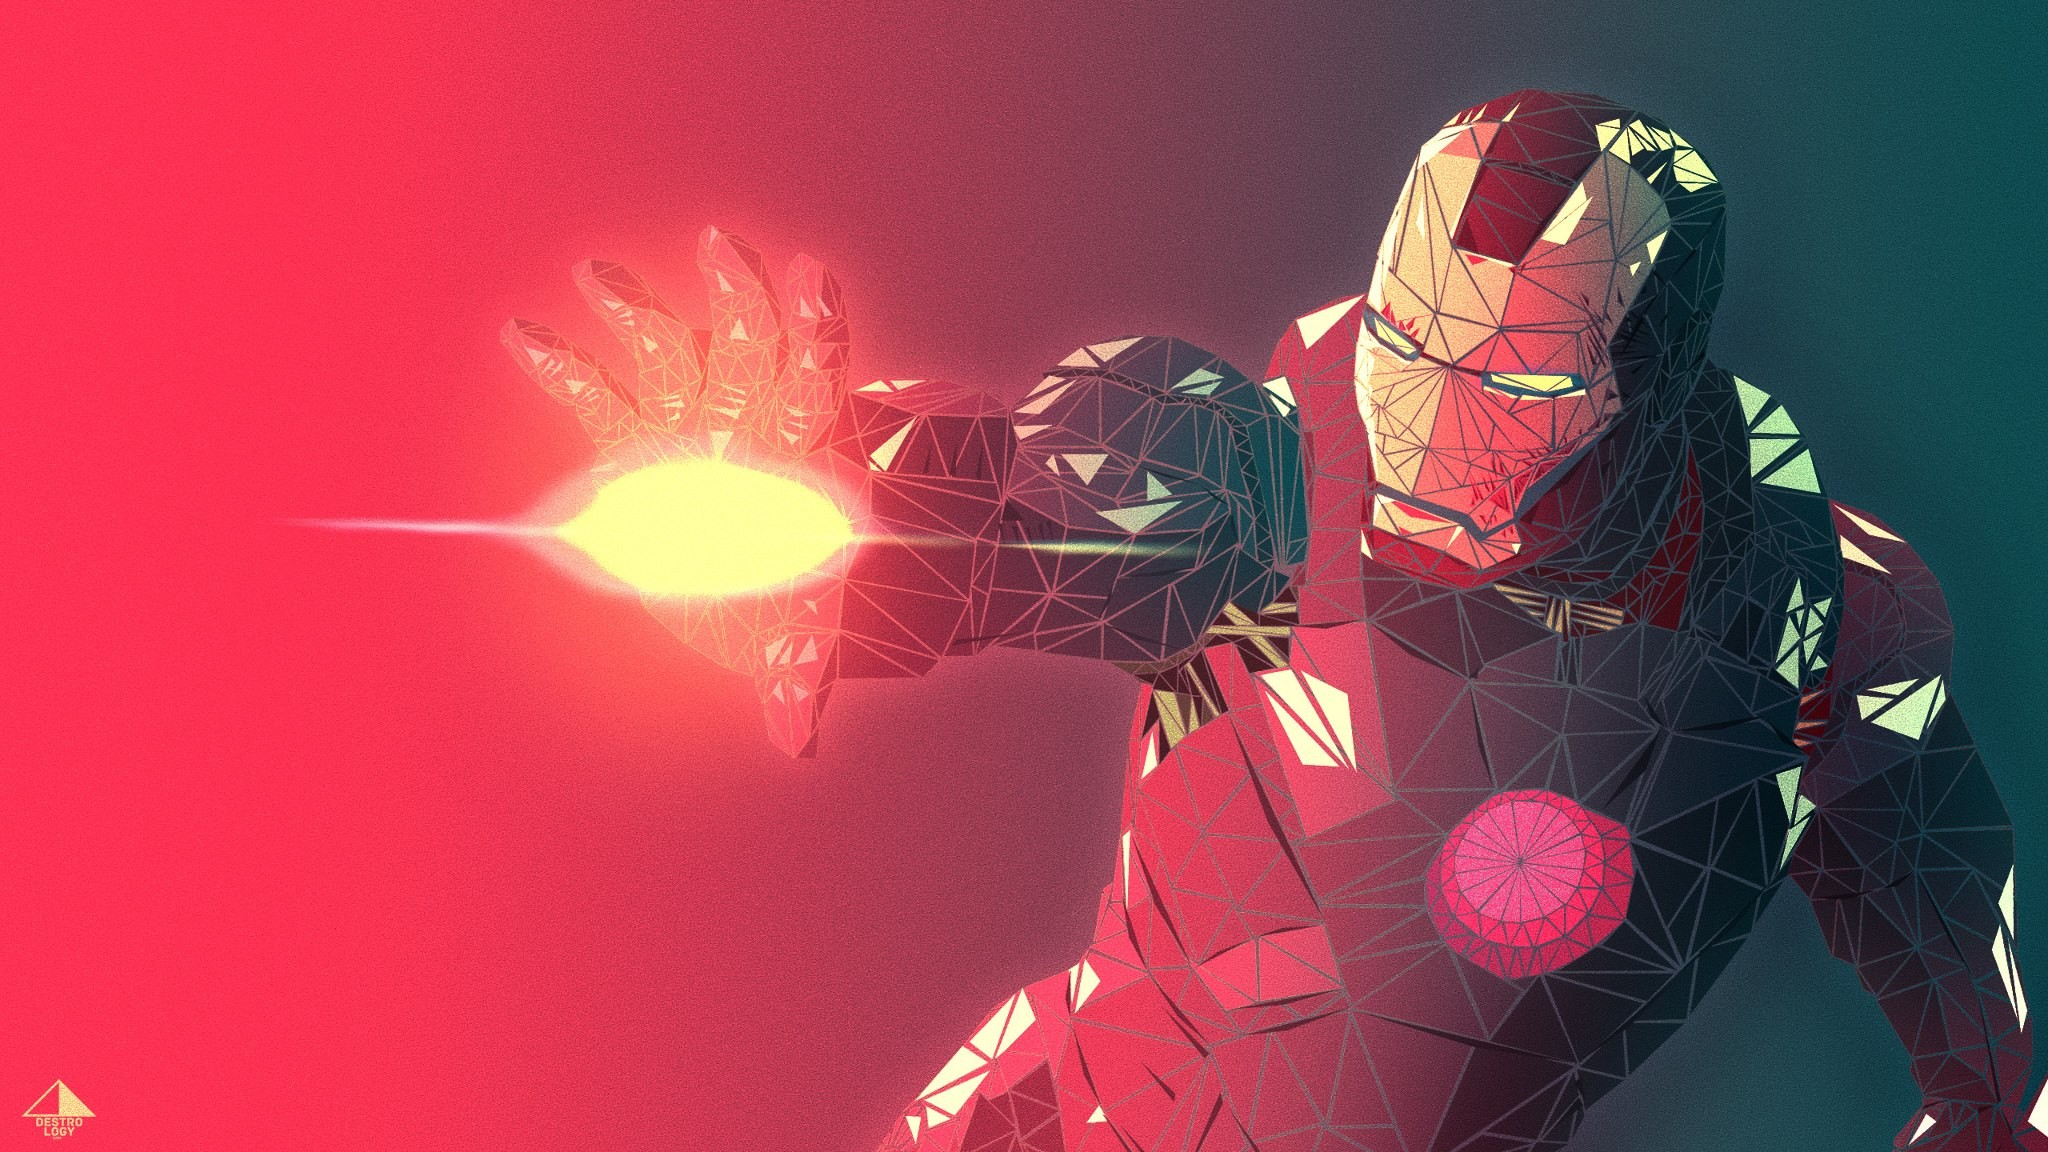 Iron Man Abstract 4kjpg 20481152 Wallpaper Hd Artist 4k